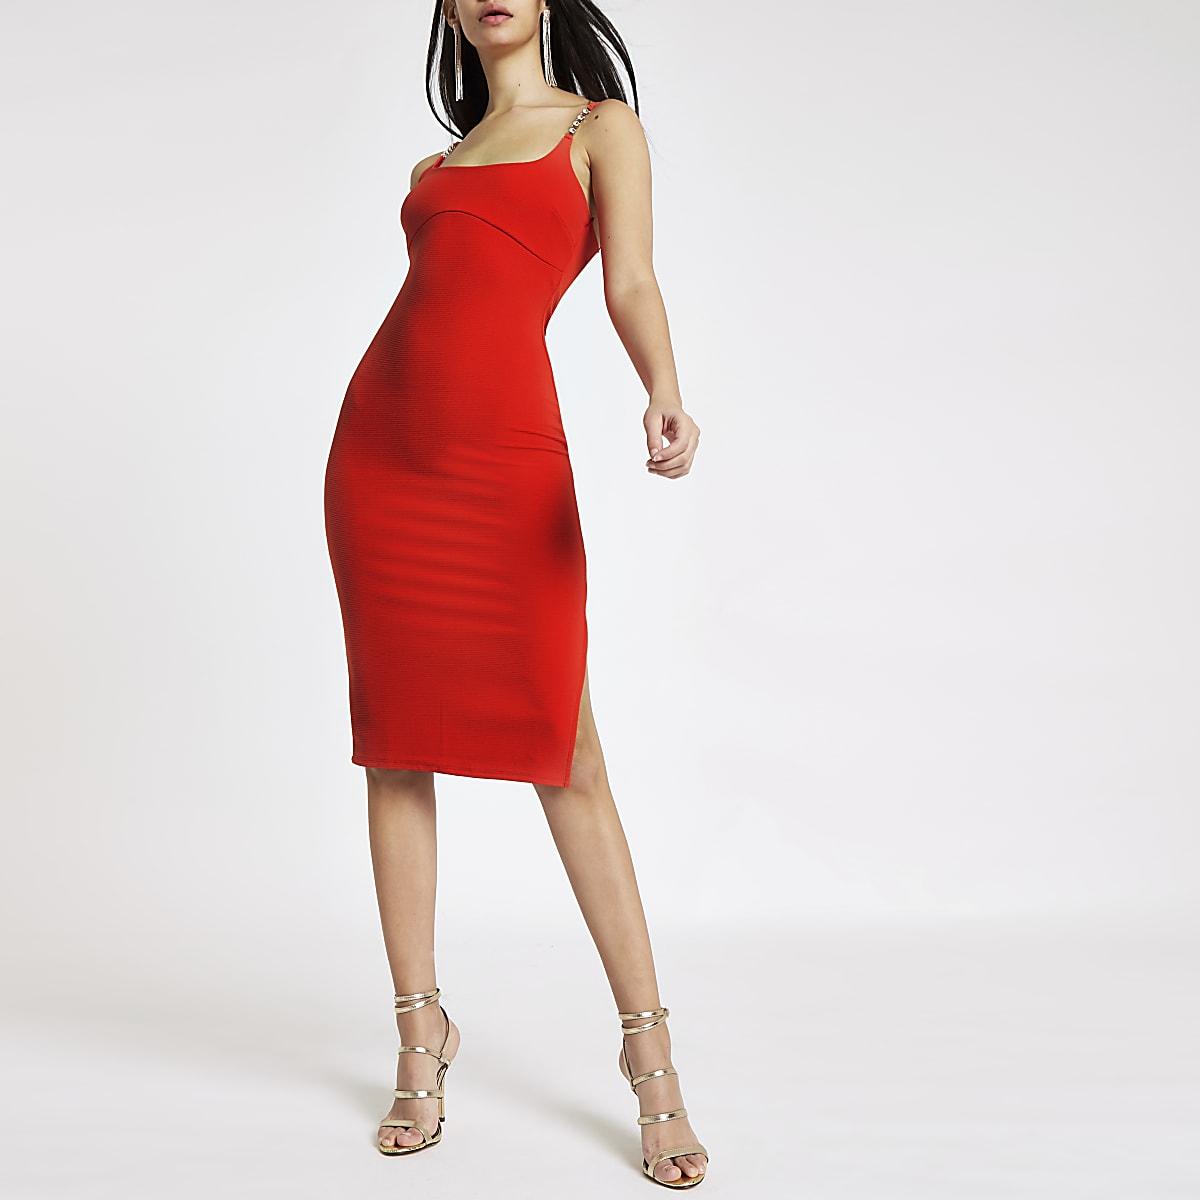 e581831facd6 Red ribbed diamante trim midi dress - Bodycon Dresses - Dresses - women